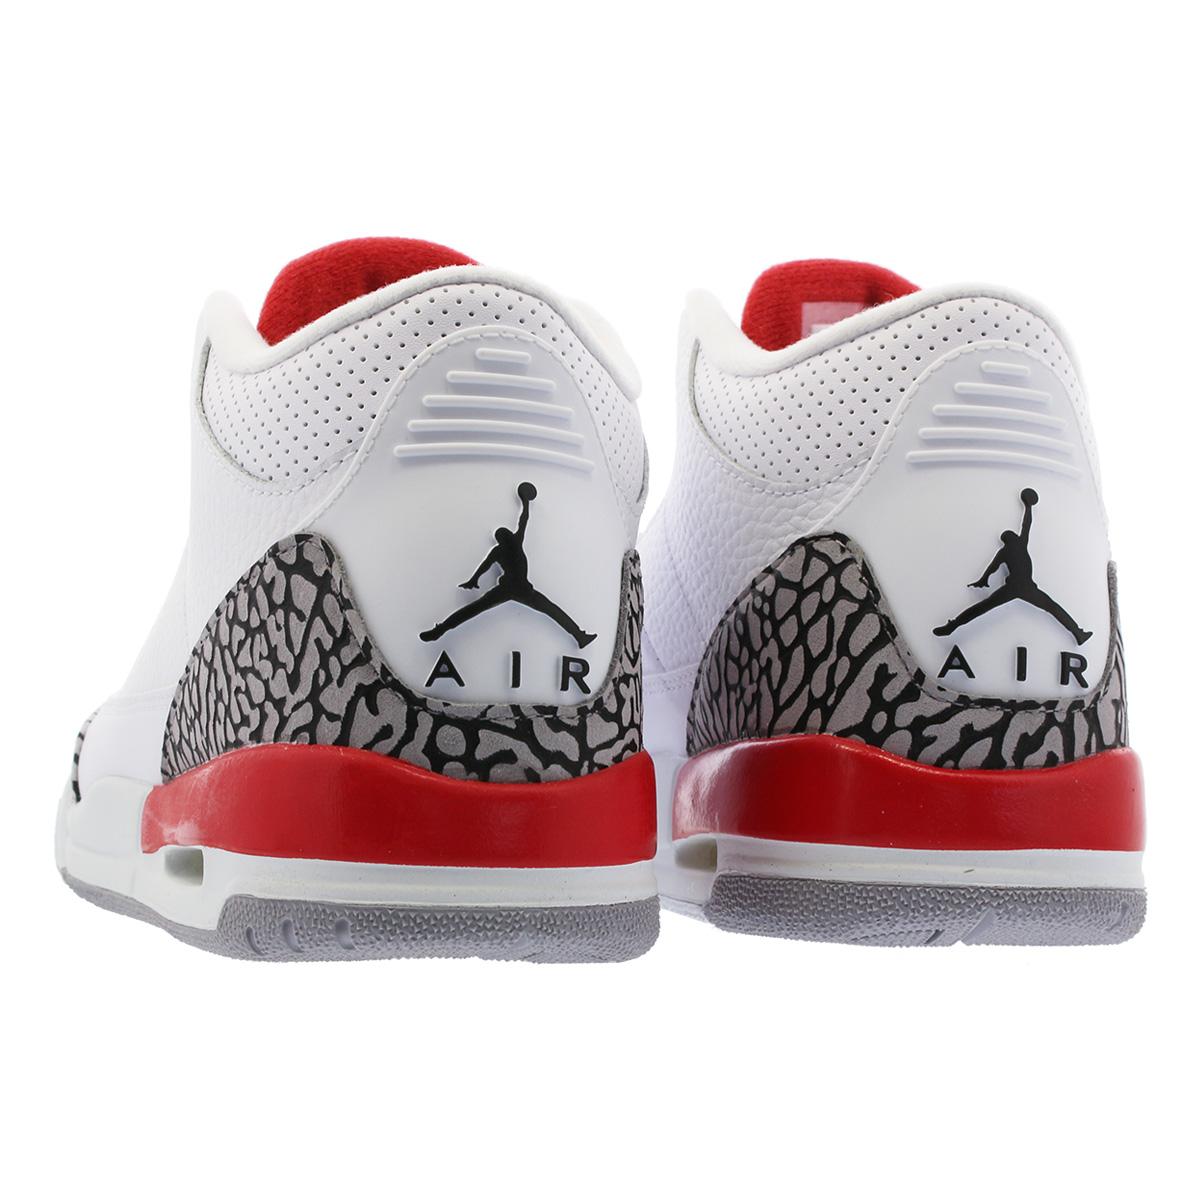 93c597e7e0a NIKE AIR JORDAN 3 RETRO BG Nike Air Jordan 3 nostalgic BG WHITE CEMENT  GREY FIRE RED 398